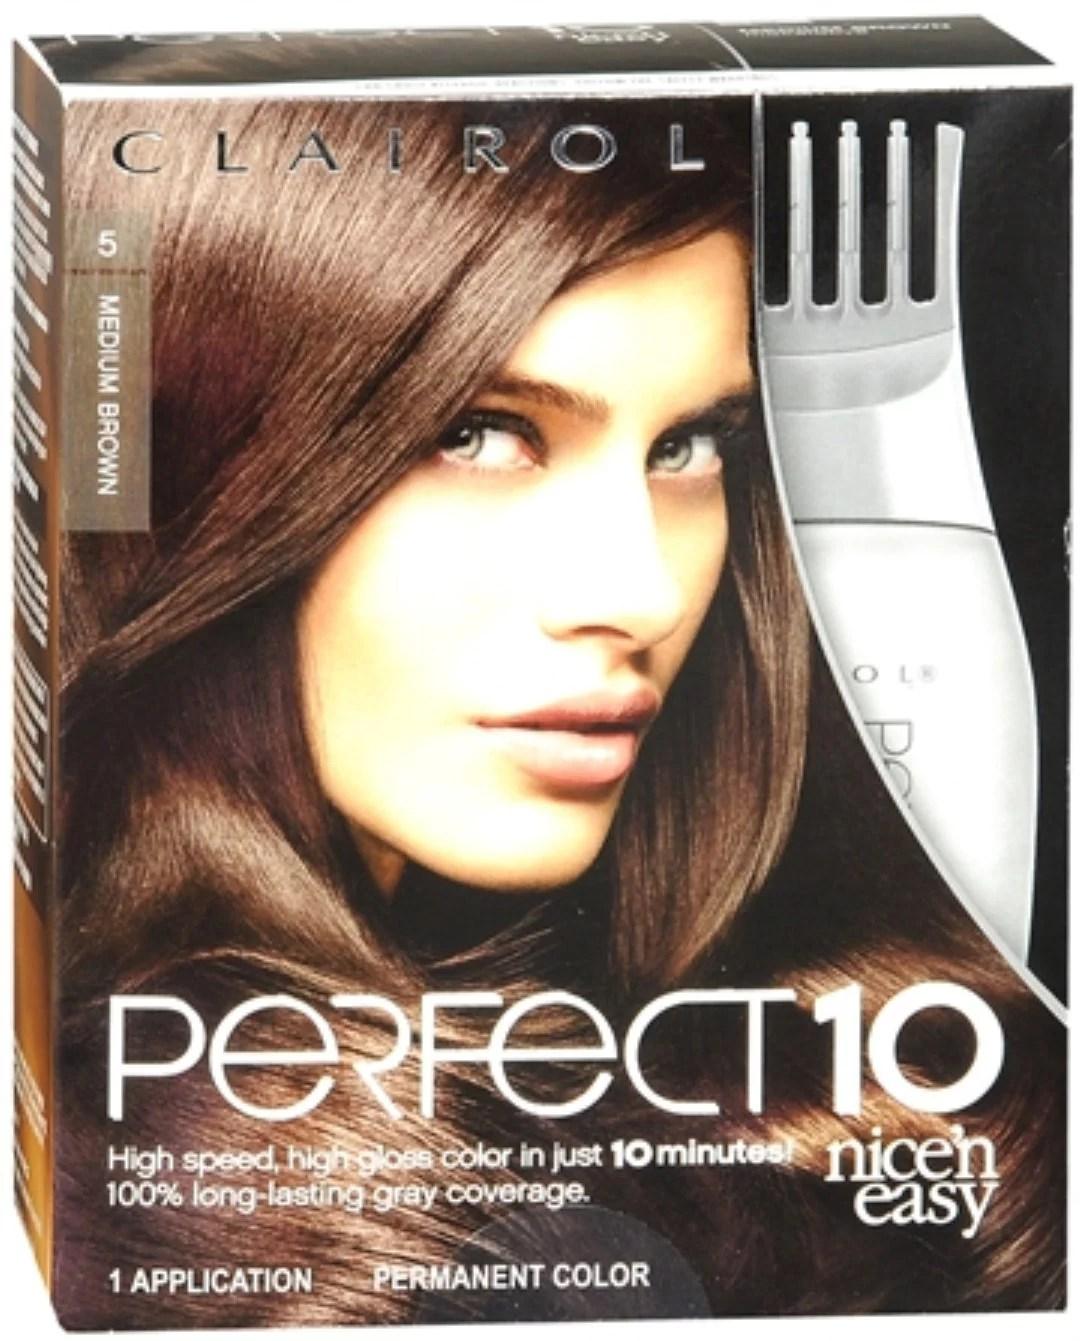 clairol nice ' easy perfect 10